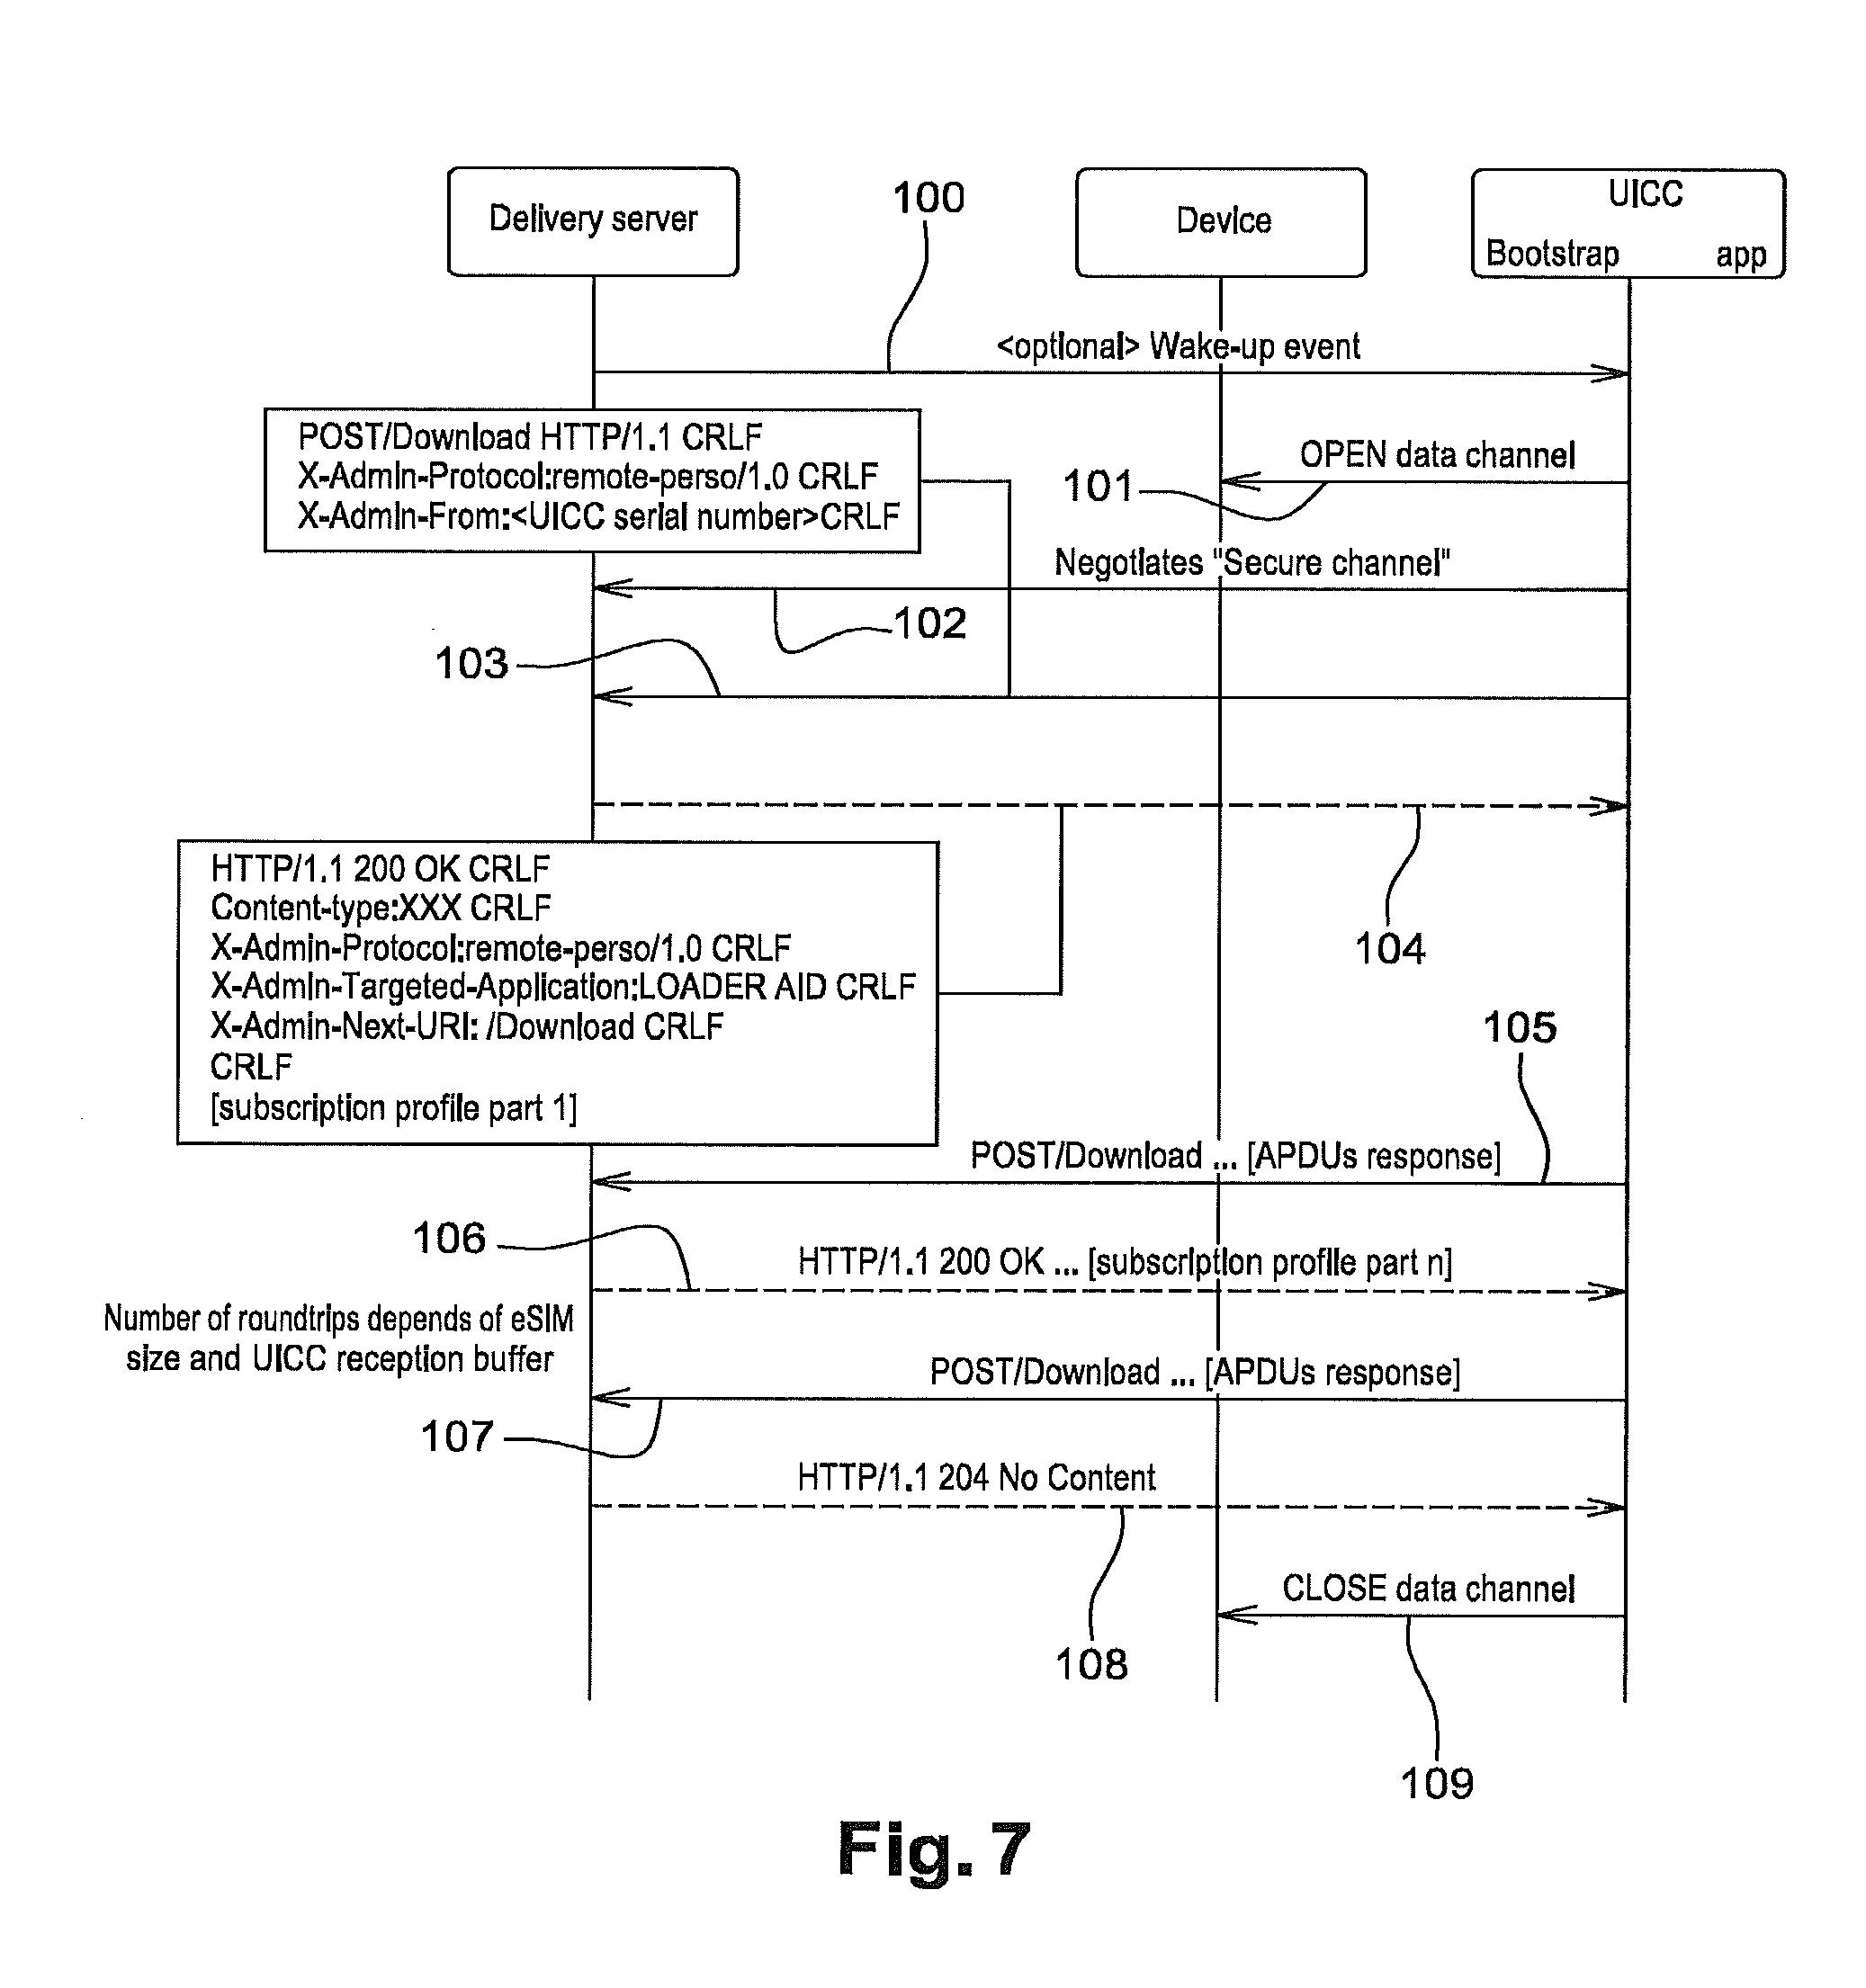 Patent US 20150134958A1